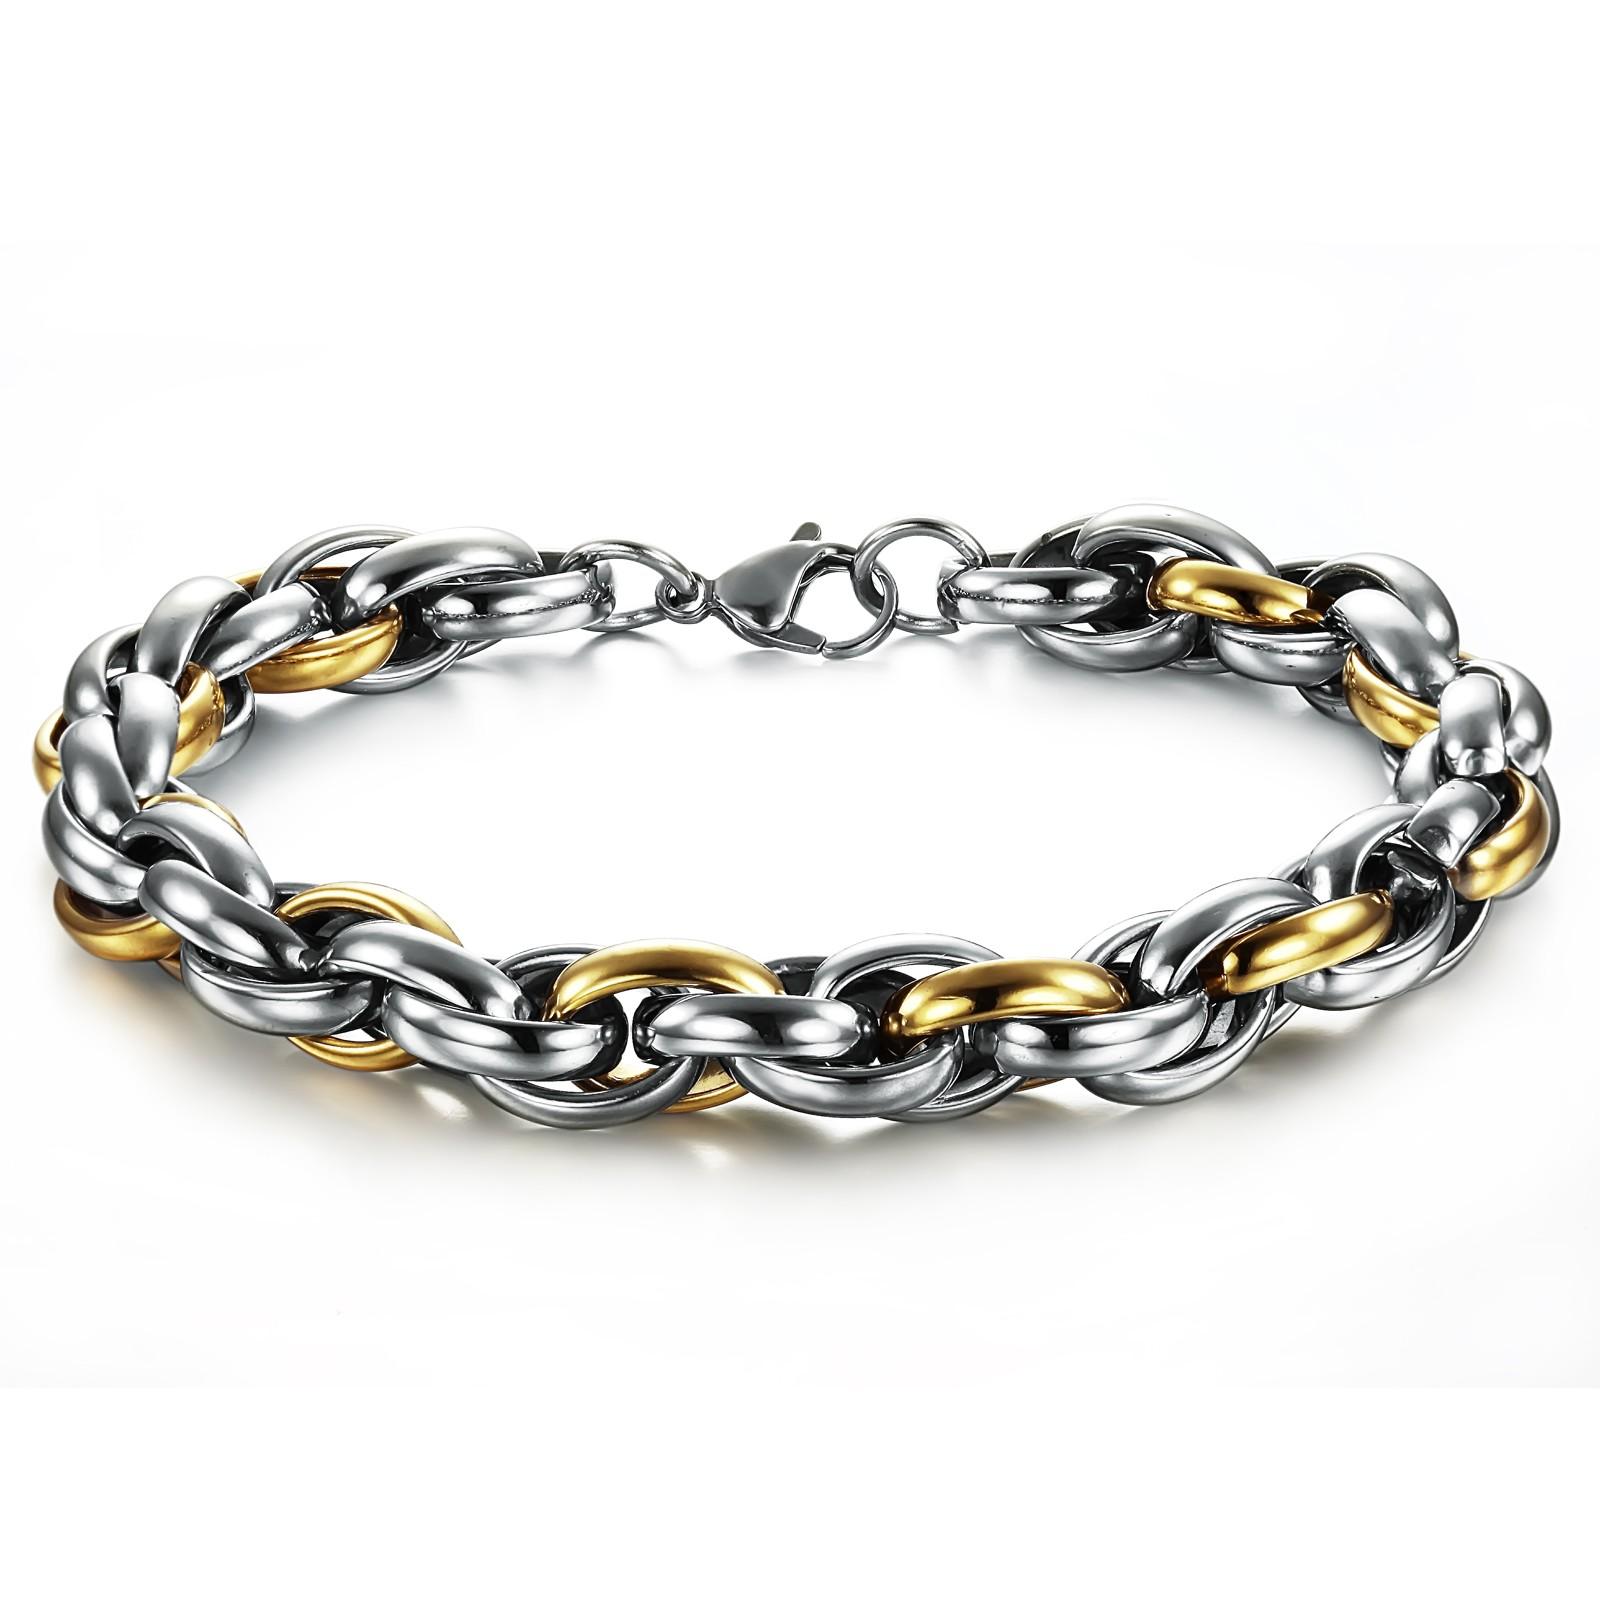 Mens Fashion Jewelry Fashion Jewelry For Men